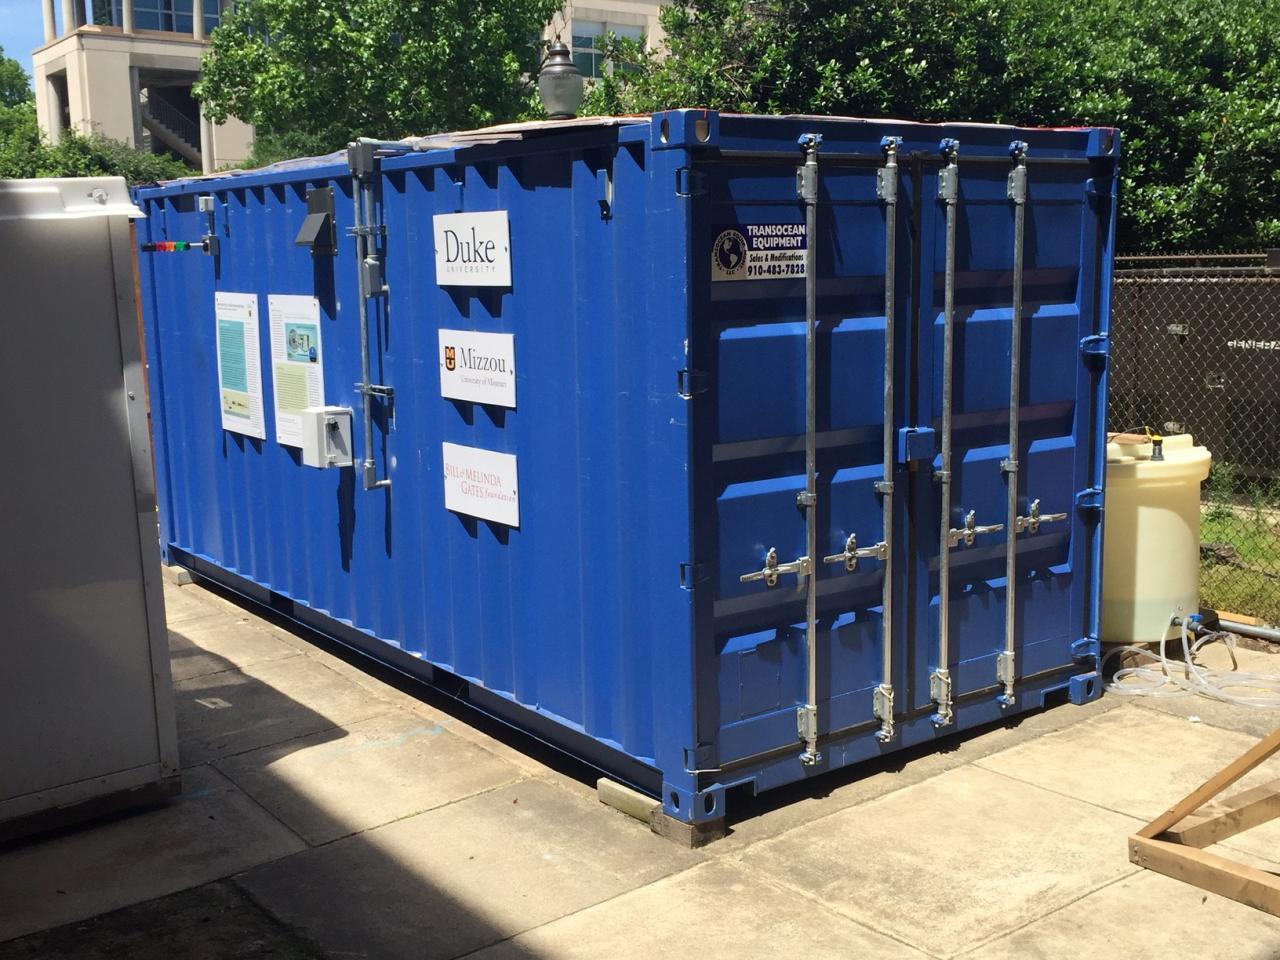 Container on Duke Campus